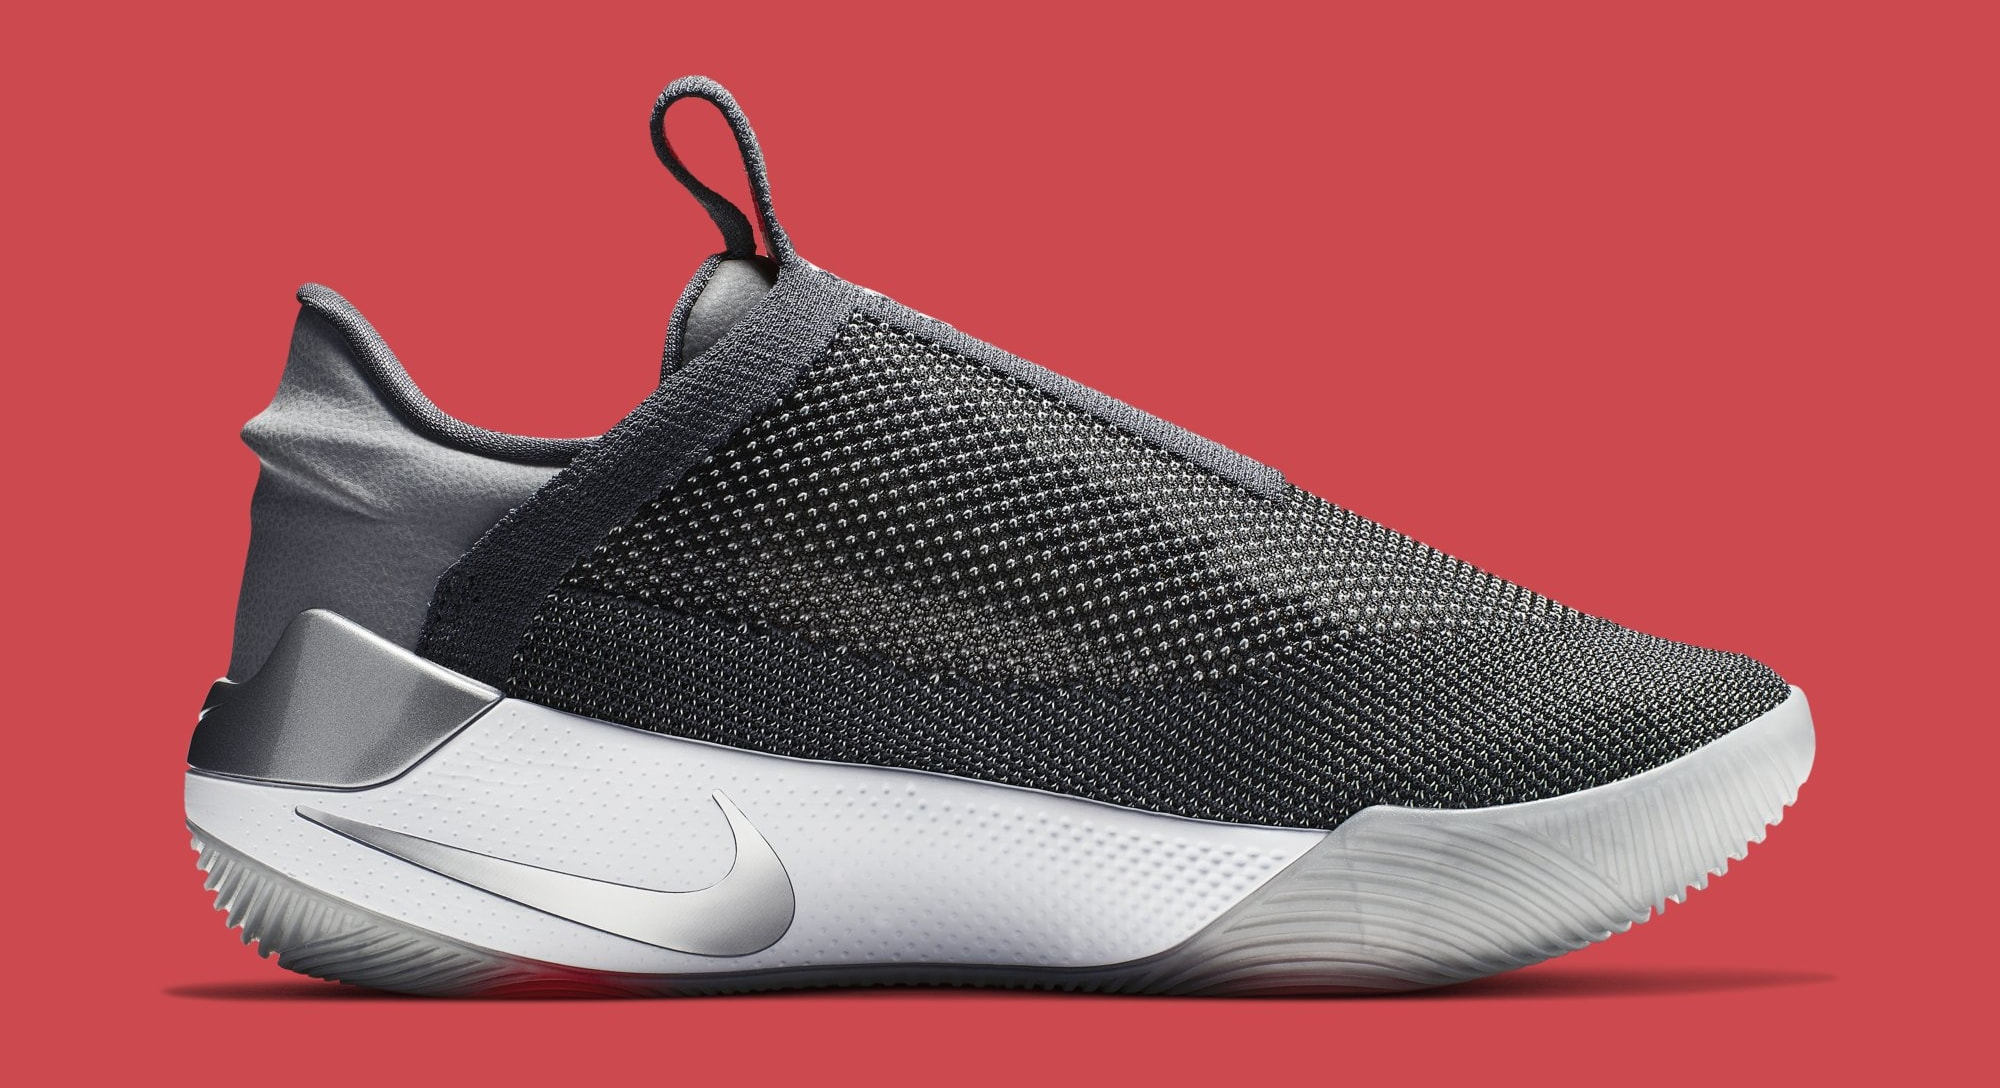 Nike Adapt BB 'Dark Grey' AO2582-004 (Medial)